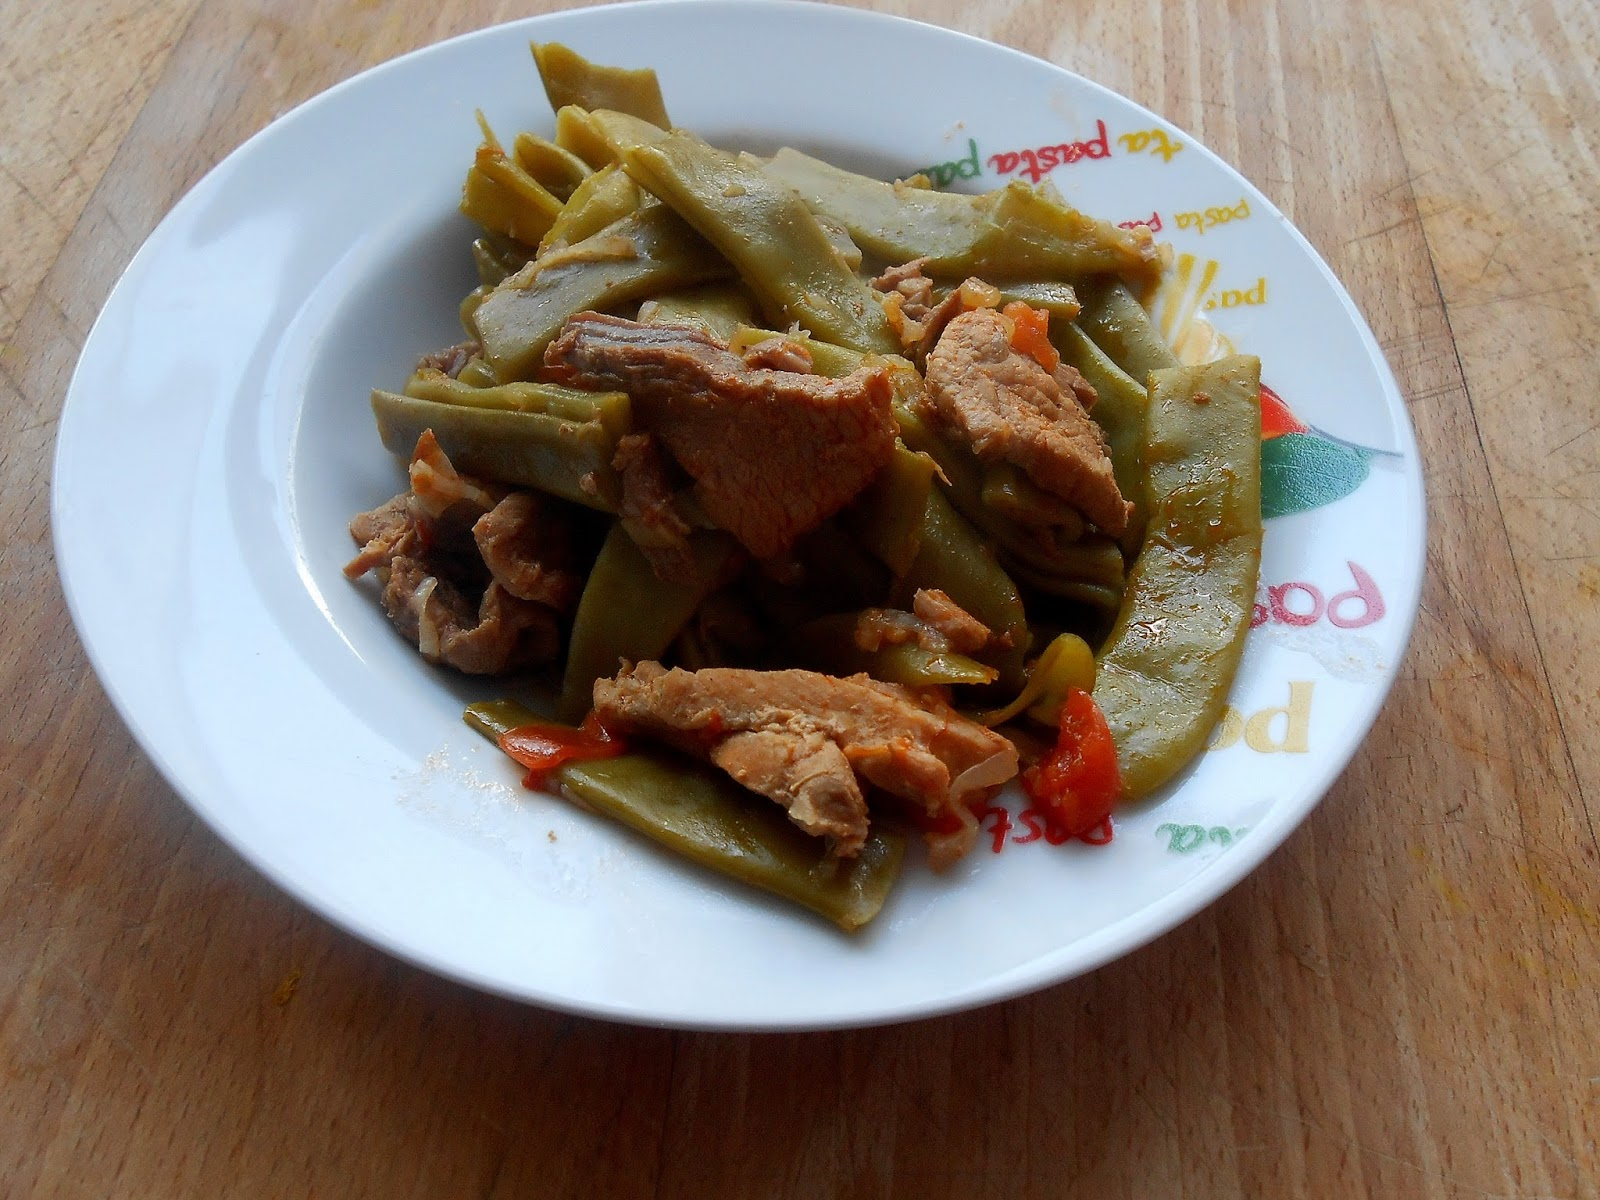 Pomme cannelle etli taze fasulye o haricots plats la - Cuisiner les haricots plats ...